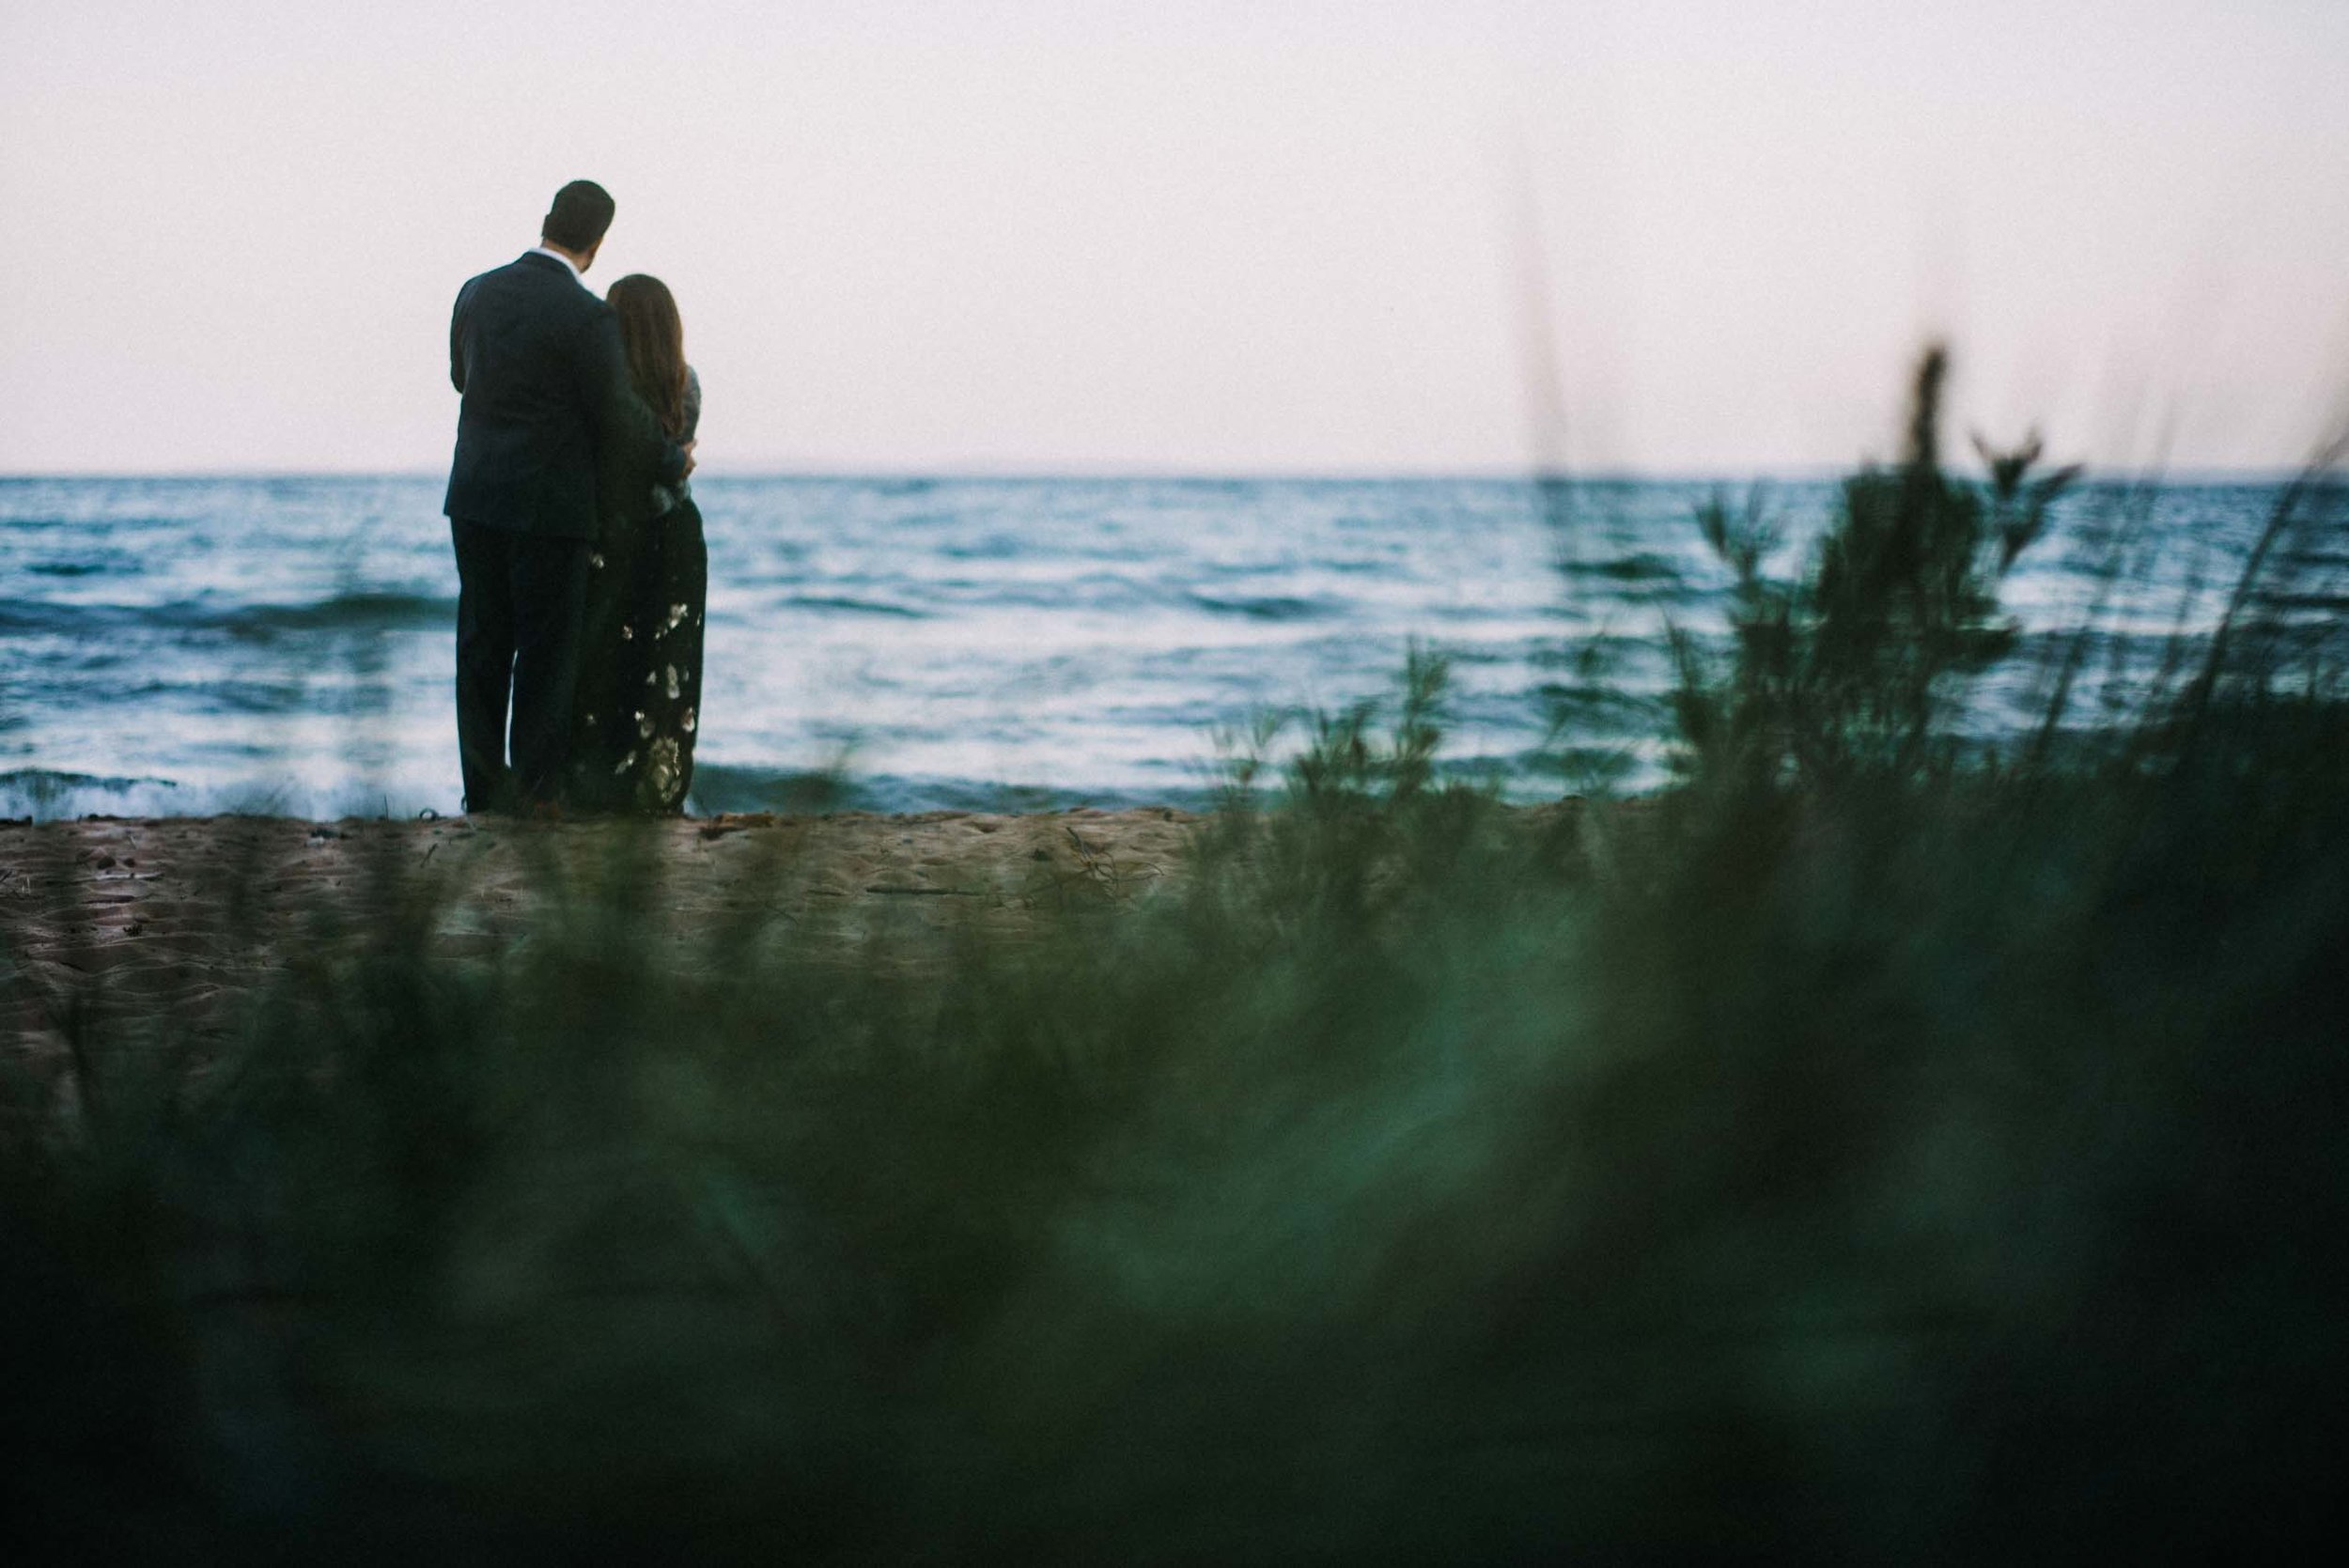 bayfield_madeline_island_wisconsin_wedding_engagement_session-6030.JPG